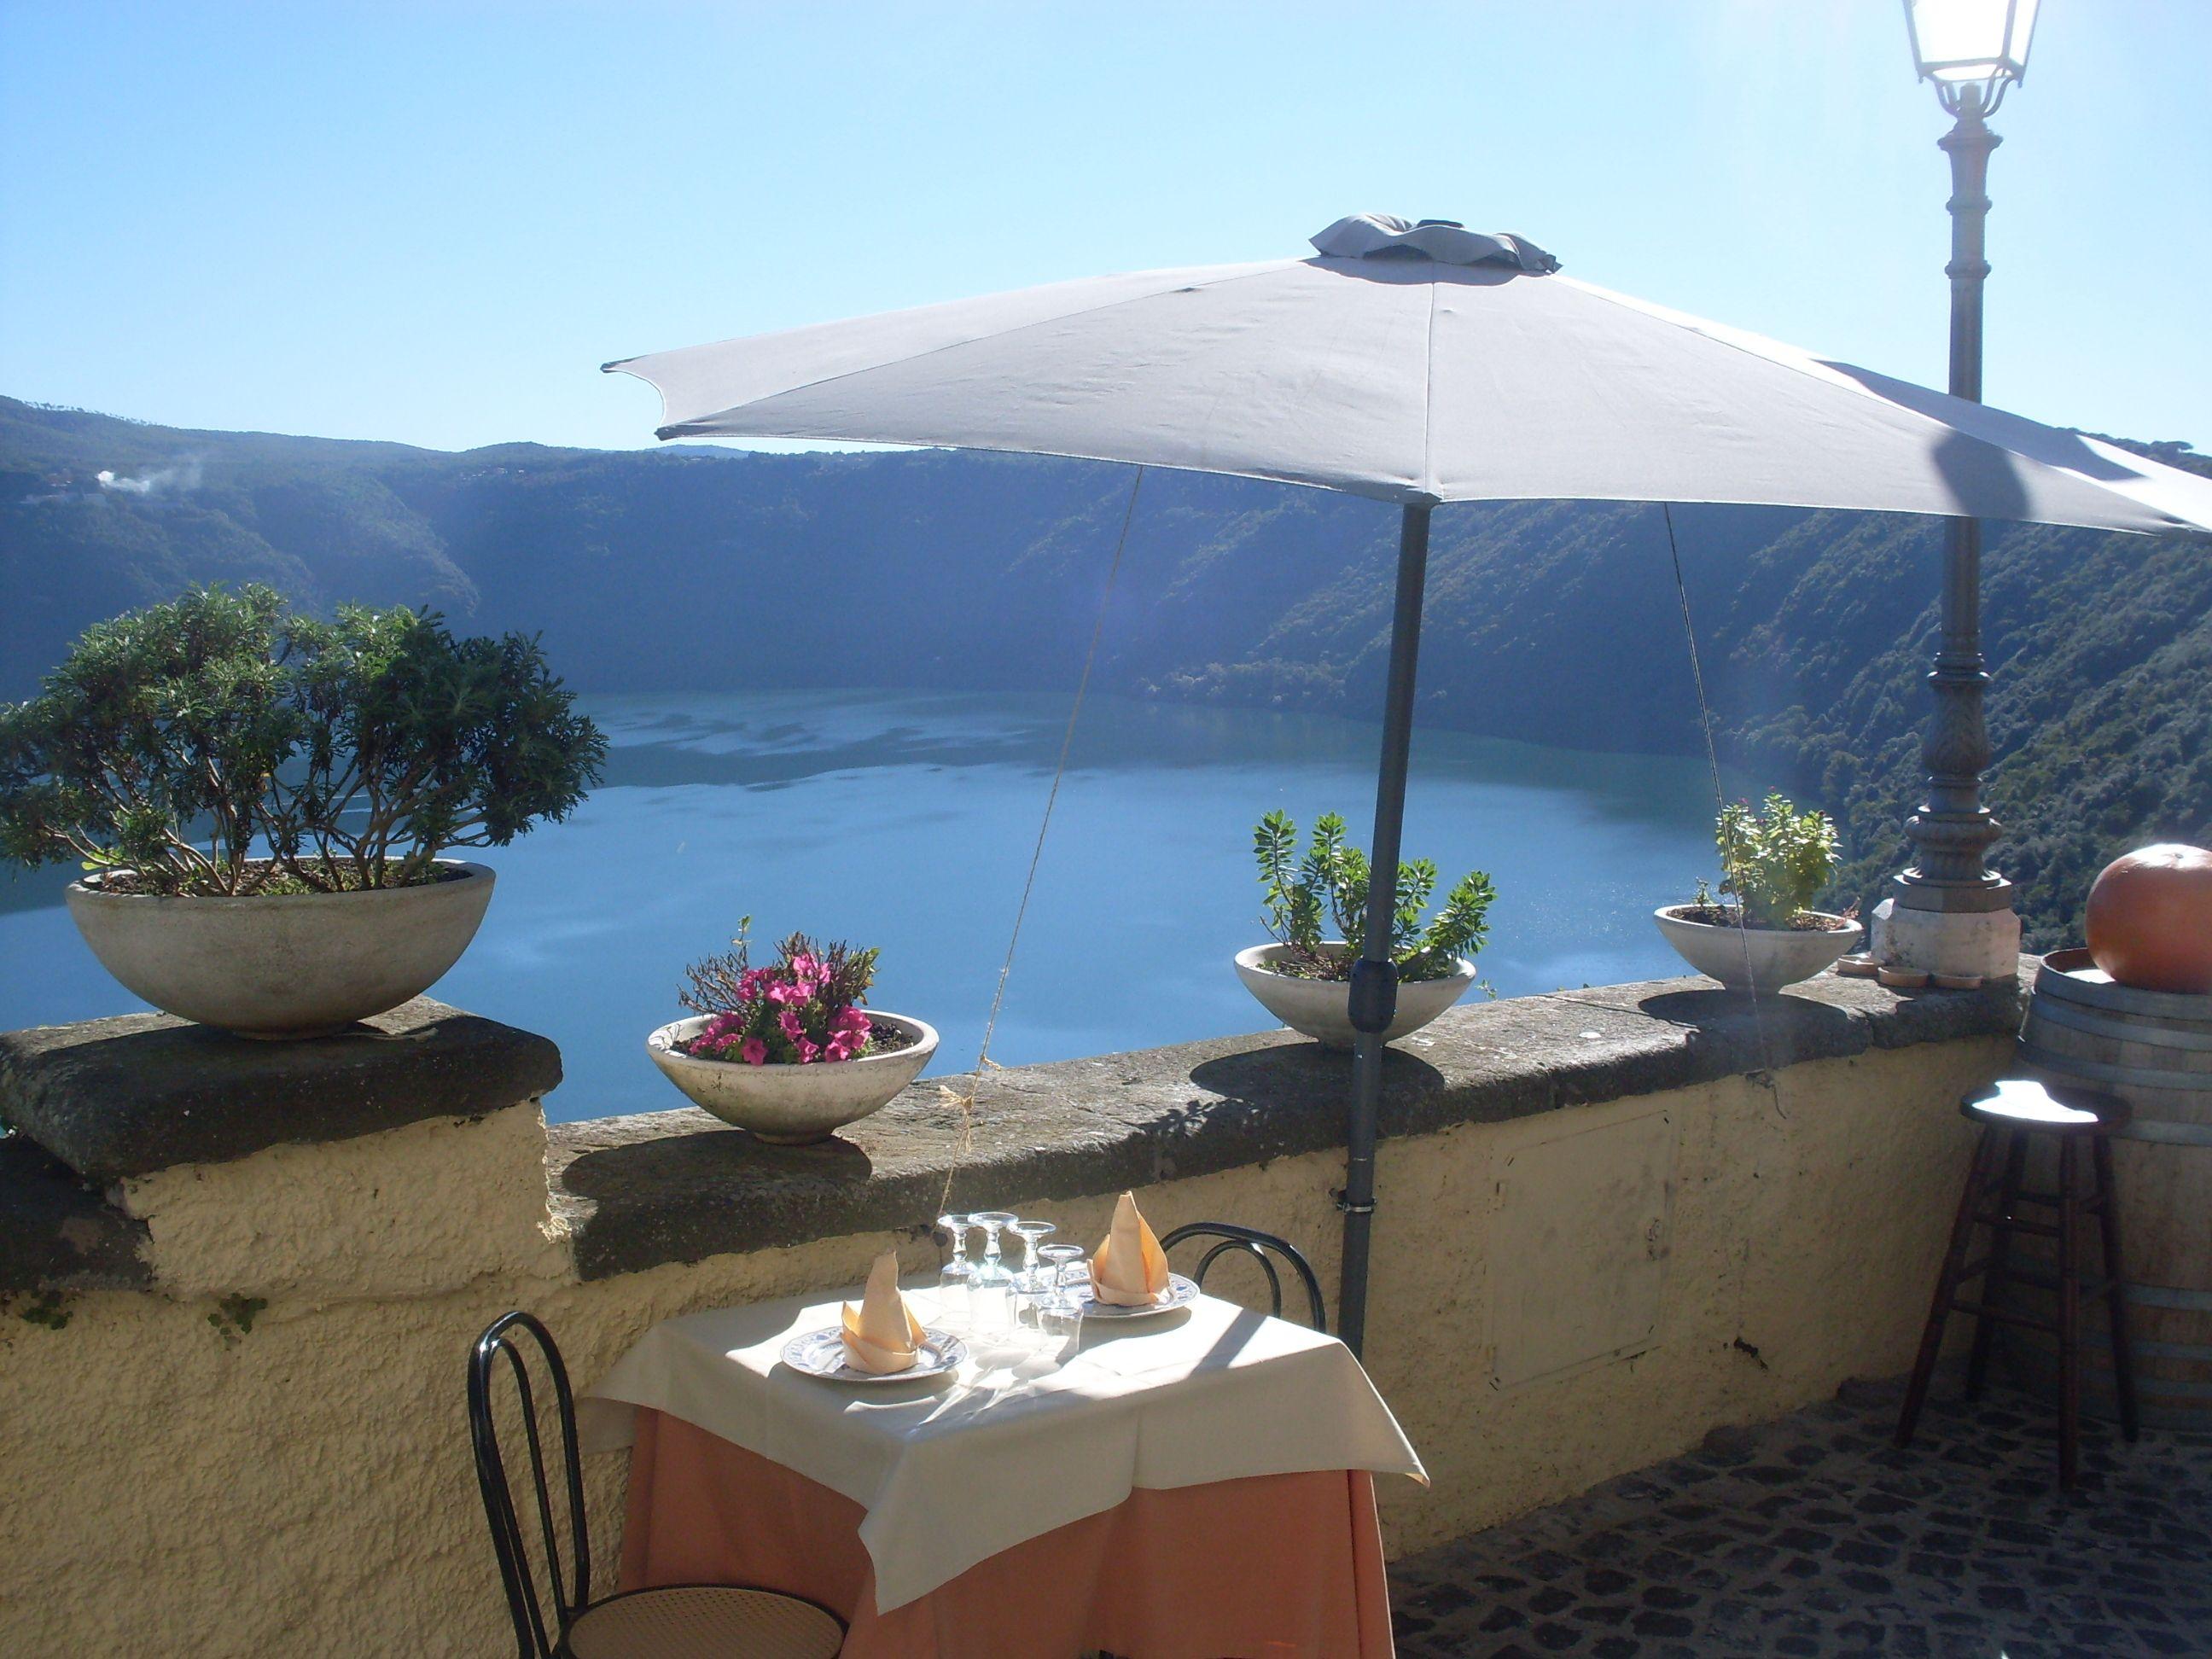 A Restaurant in Castel Gandolfo